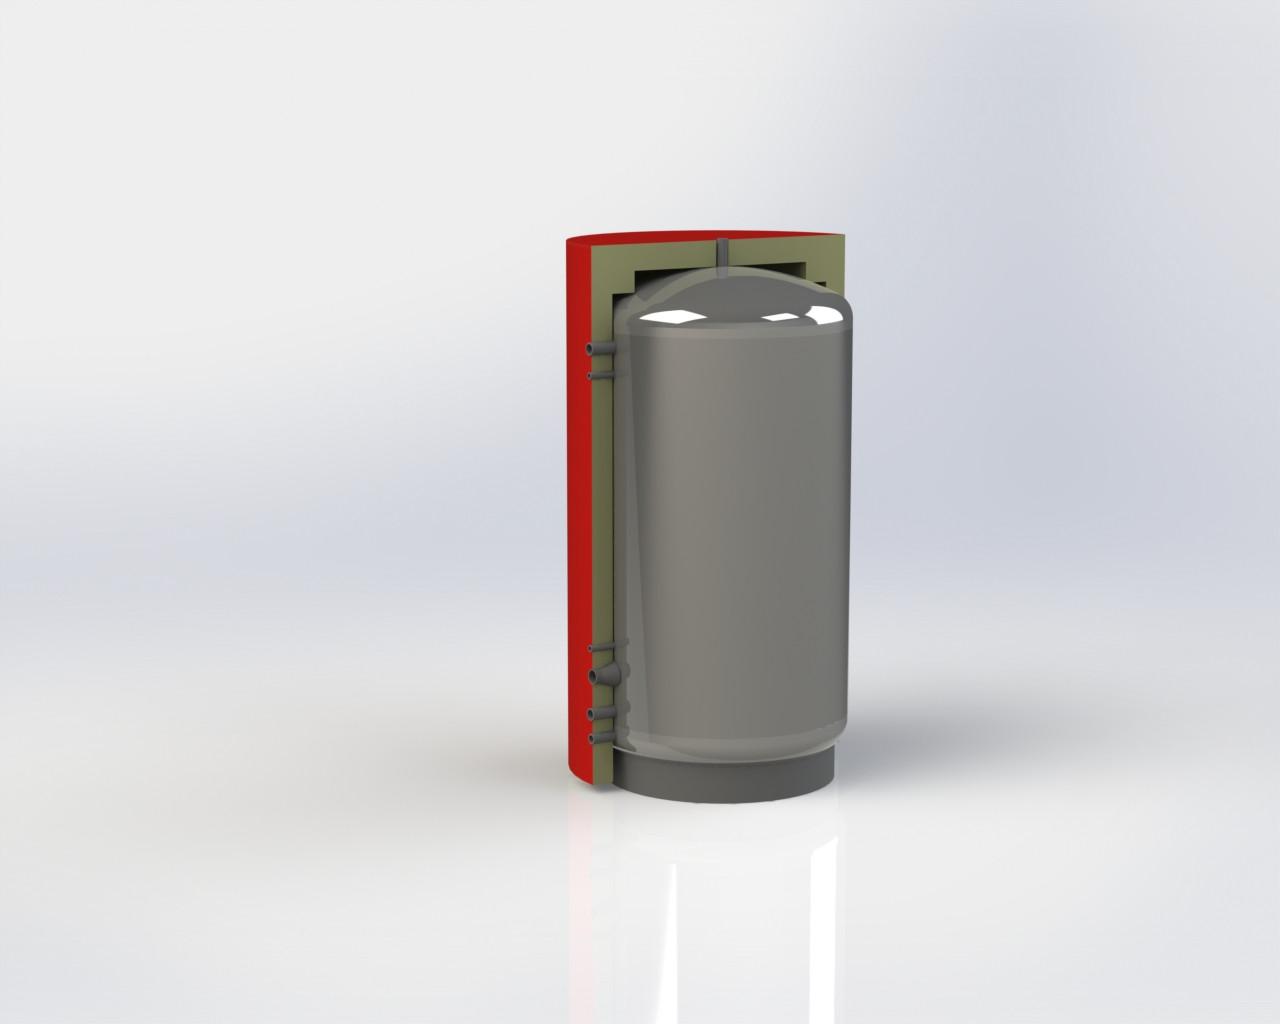 Теплоаккумулятор ЕАМ-00-1000 KHT